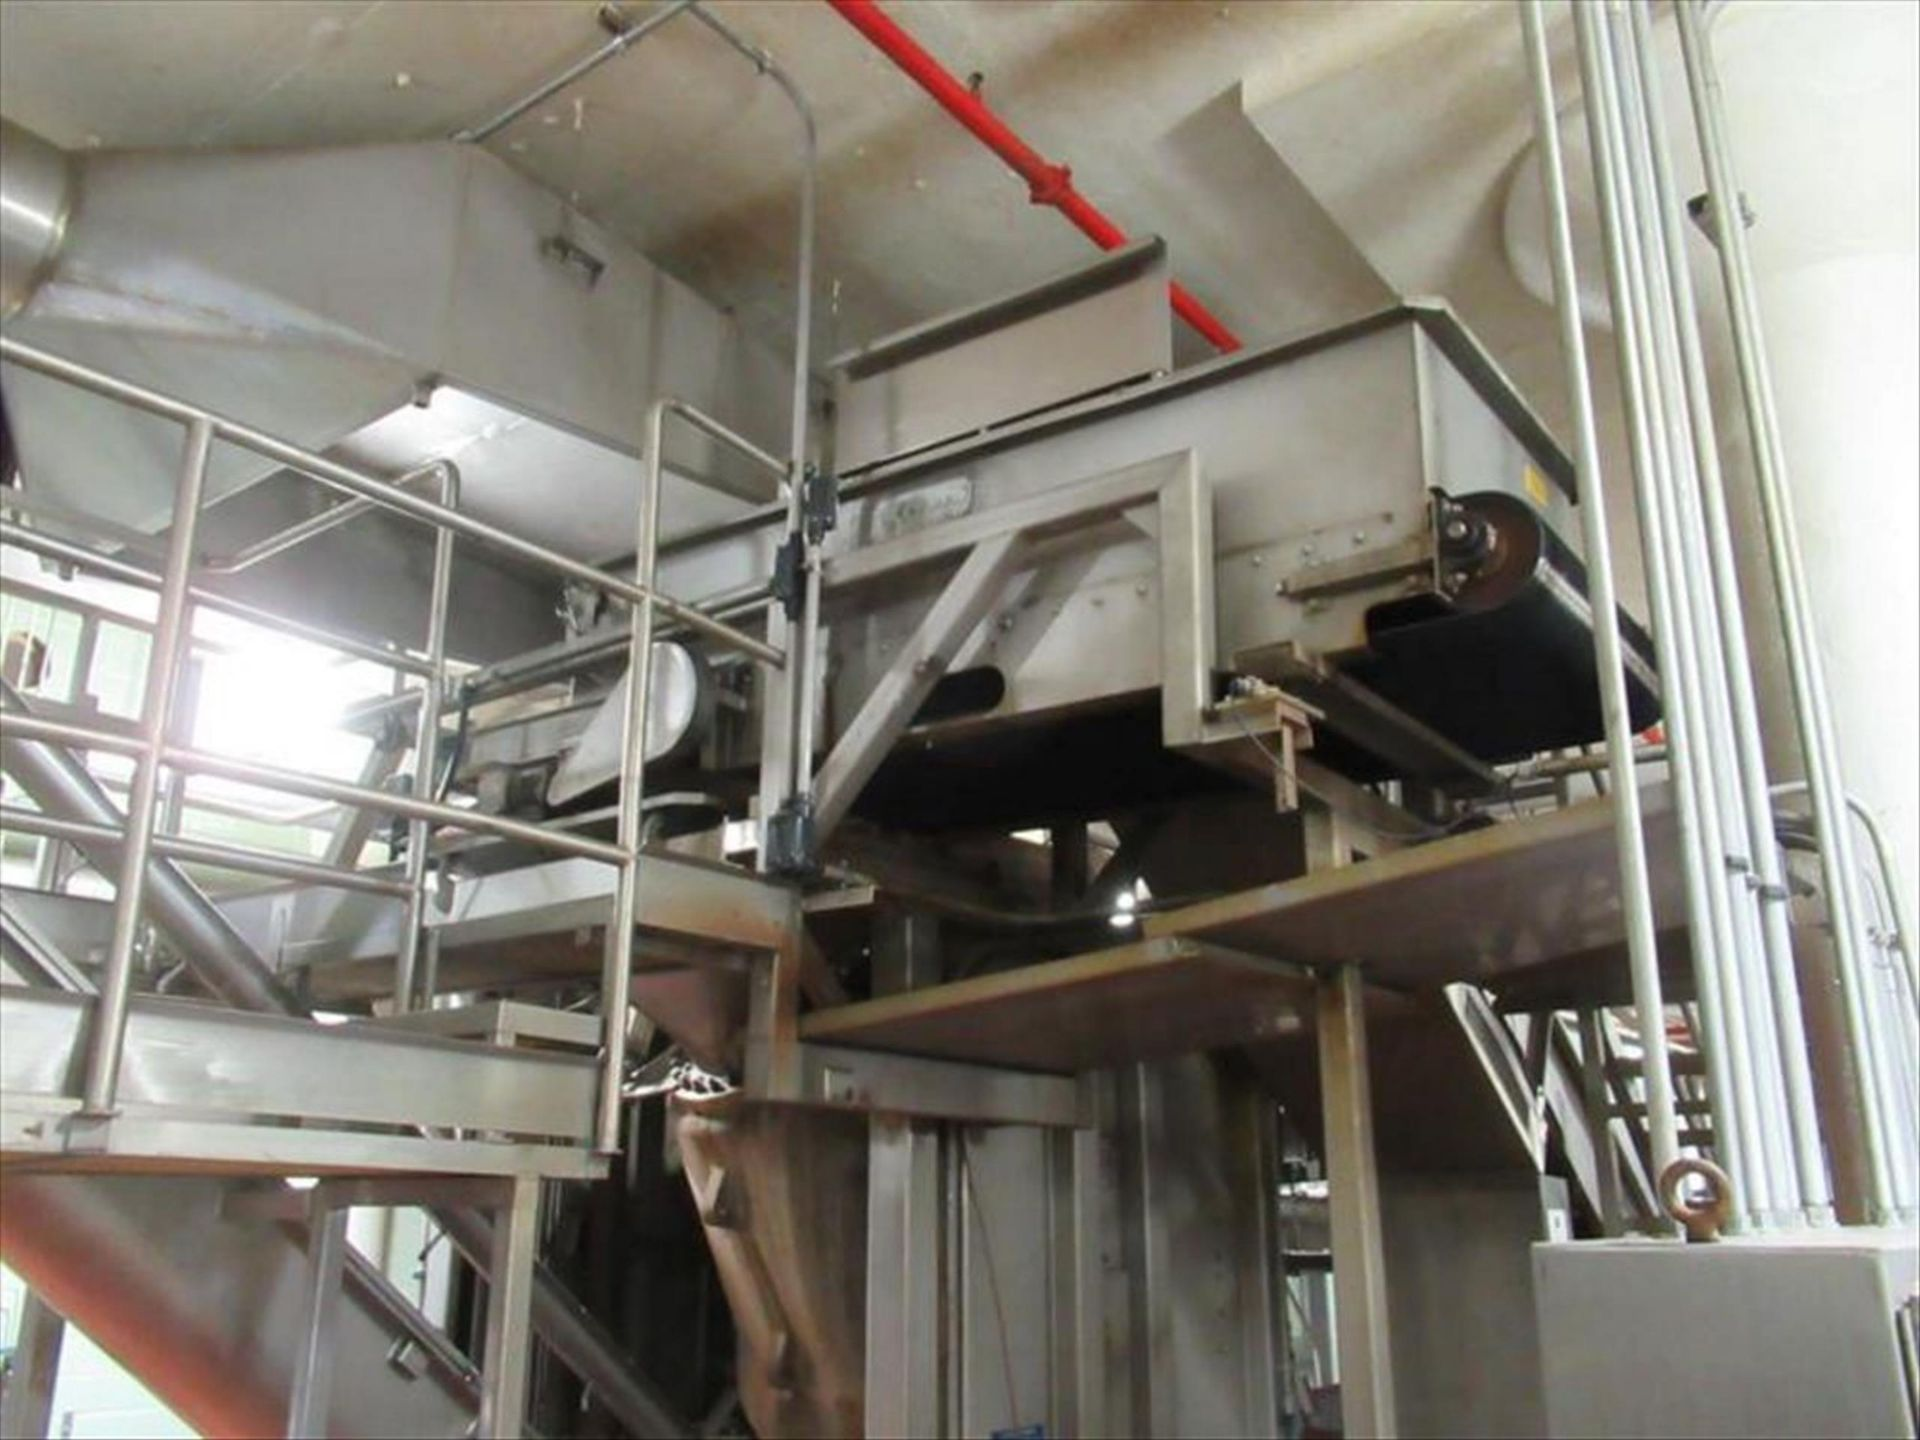 Lot 162 - Starr Weigh table conveyor 3 ft w x 6 ft l x 2 ft h, with rubber v-belt, Flintec -SB145KLB-CUC3 load